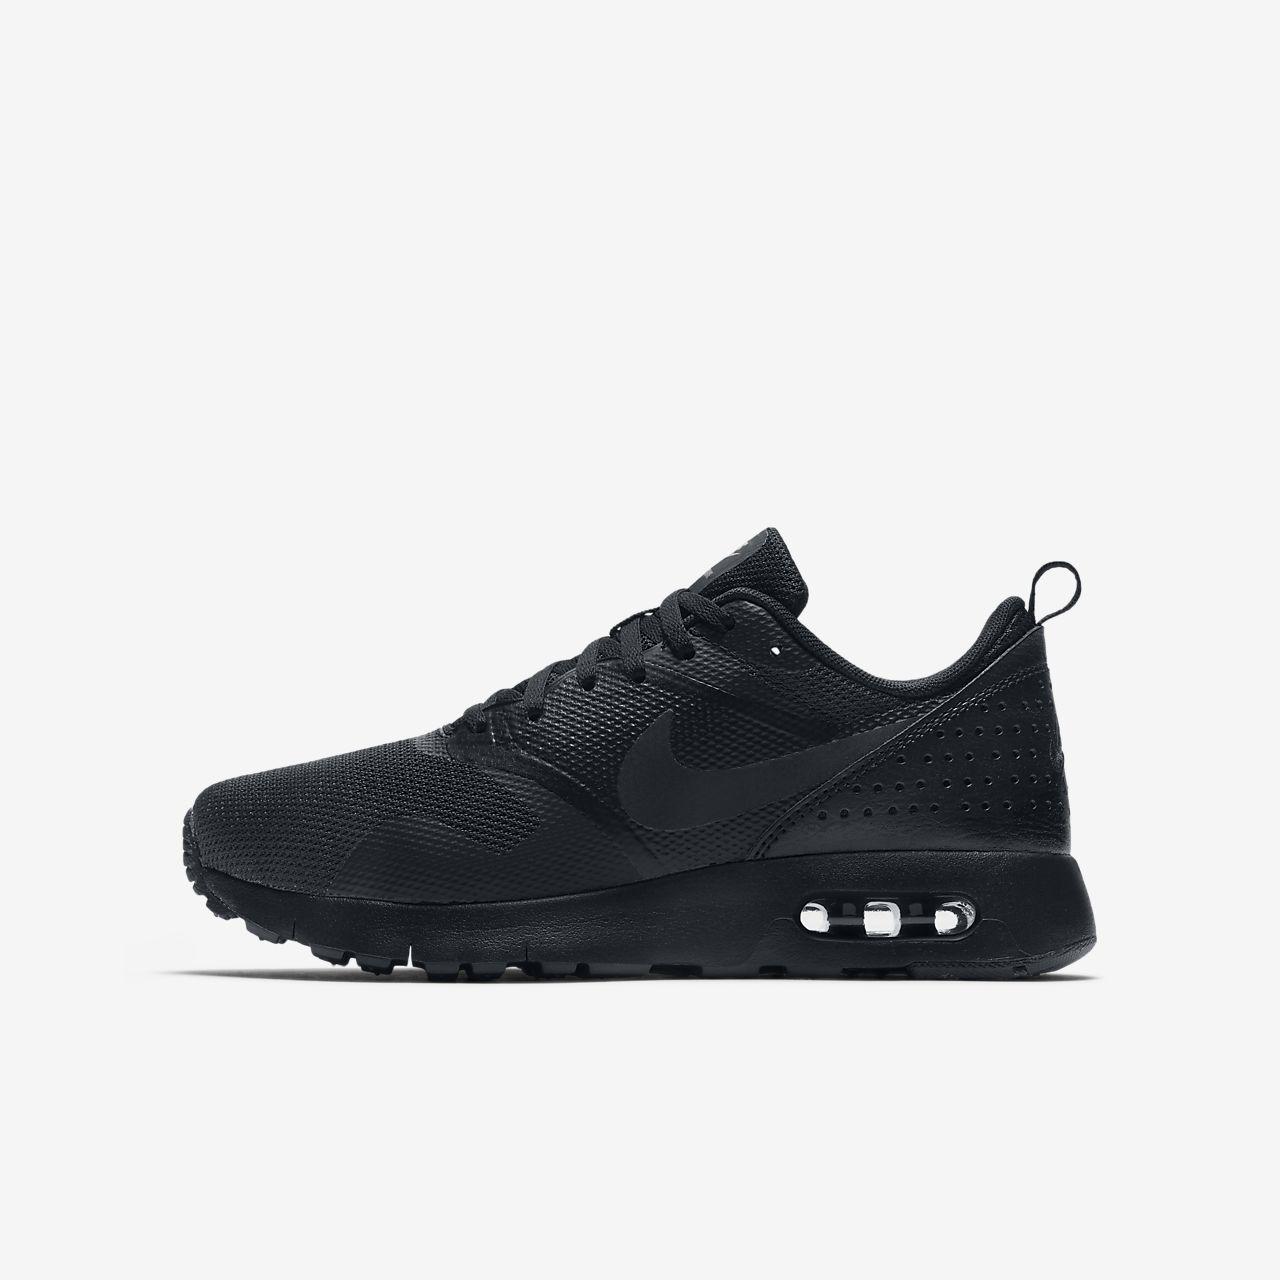 Tavas Nagyobb GyerekeknekHu Nike Cipő Max Air 1uF3cTlKJ